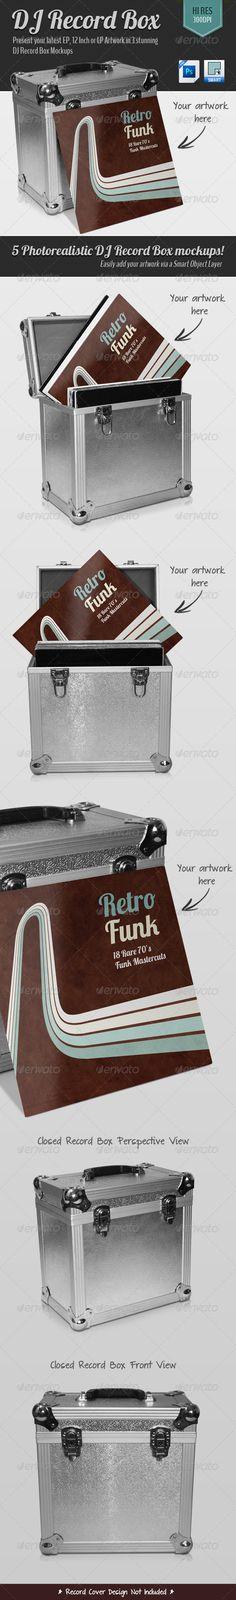 DJ Record Box — Photoshop PSD #flight case #record • Available here → https://graphicriver.net/item/dj-record-box/4450323?ref=pxcr